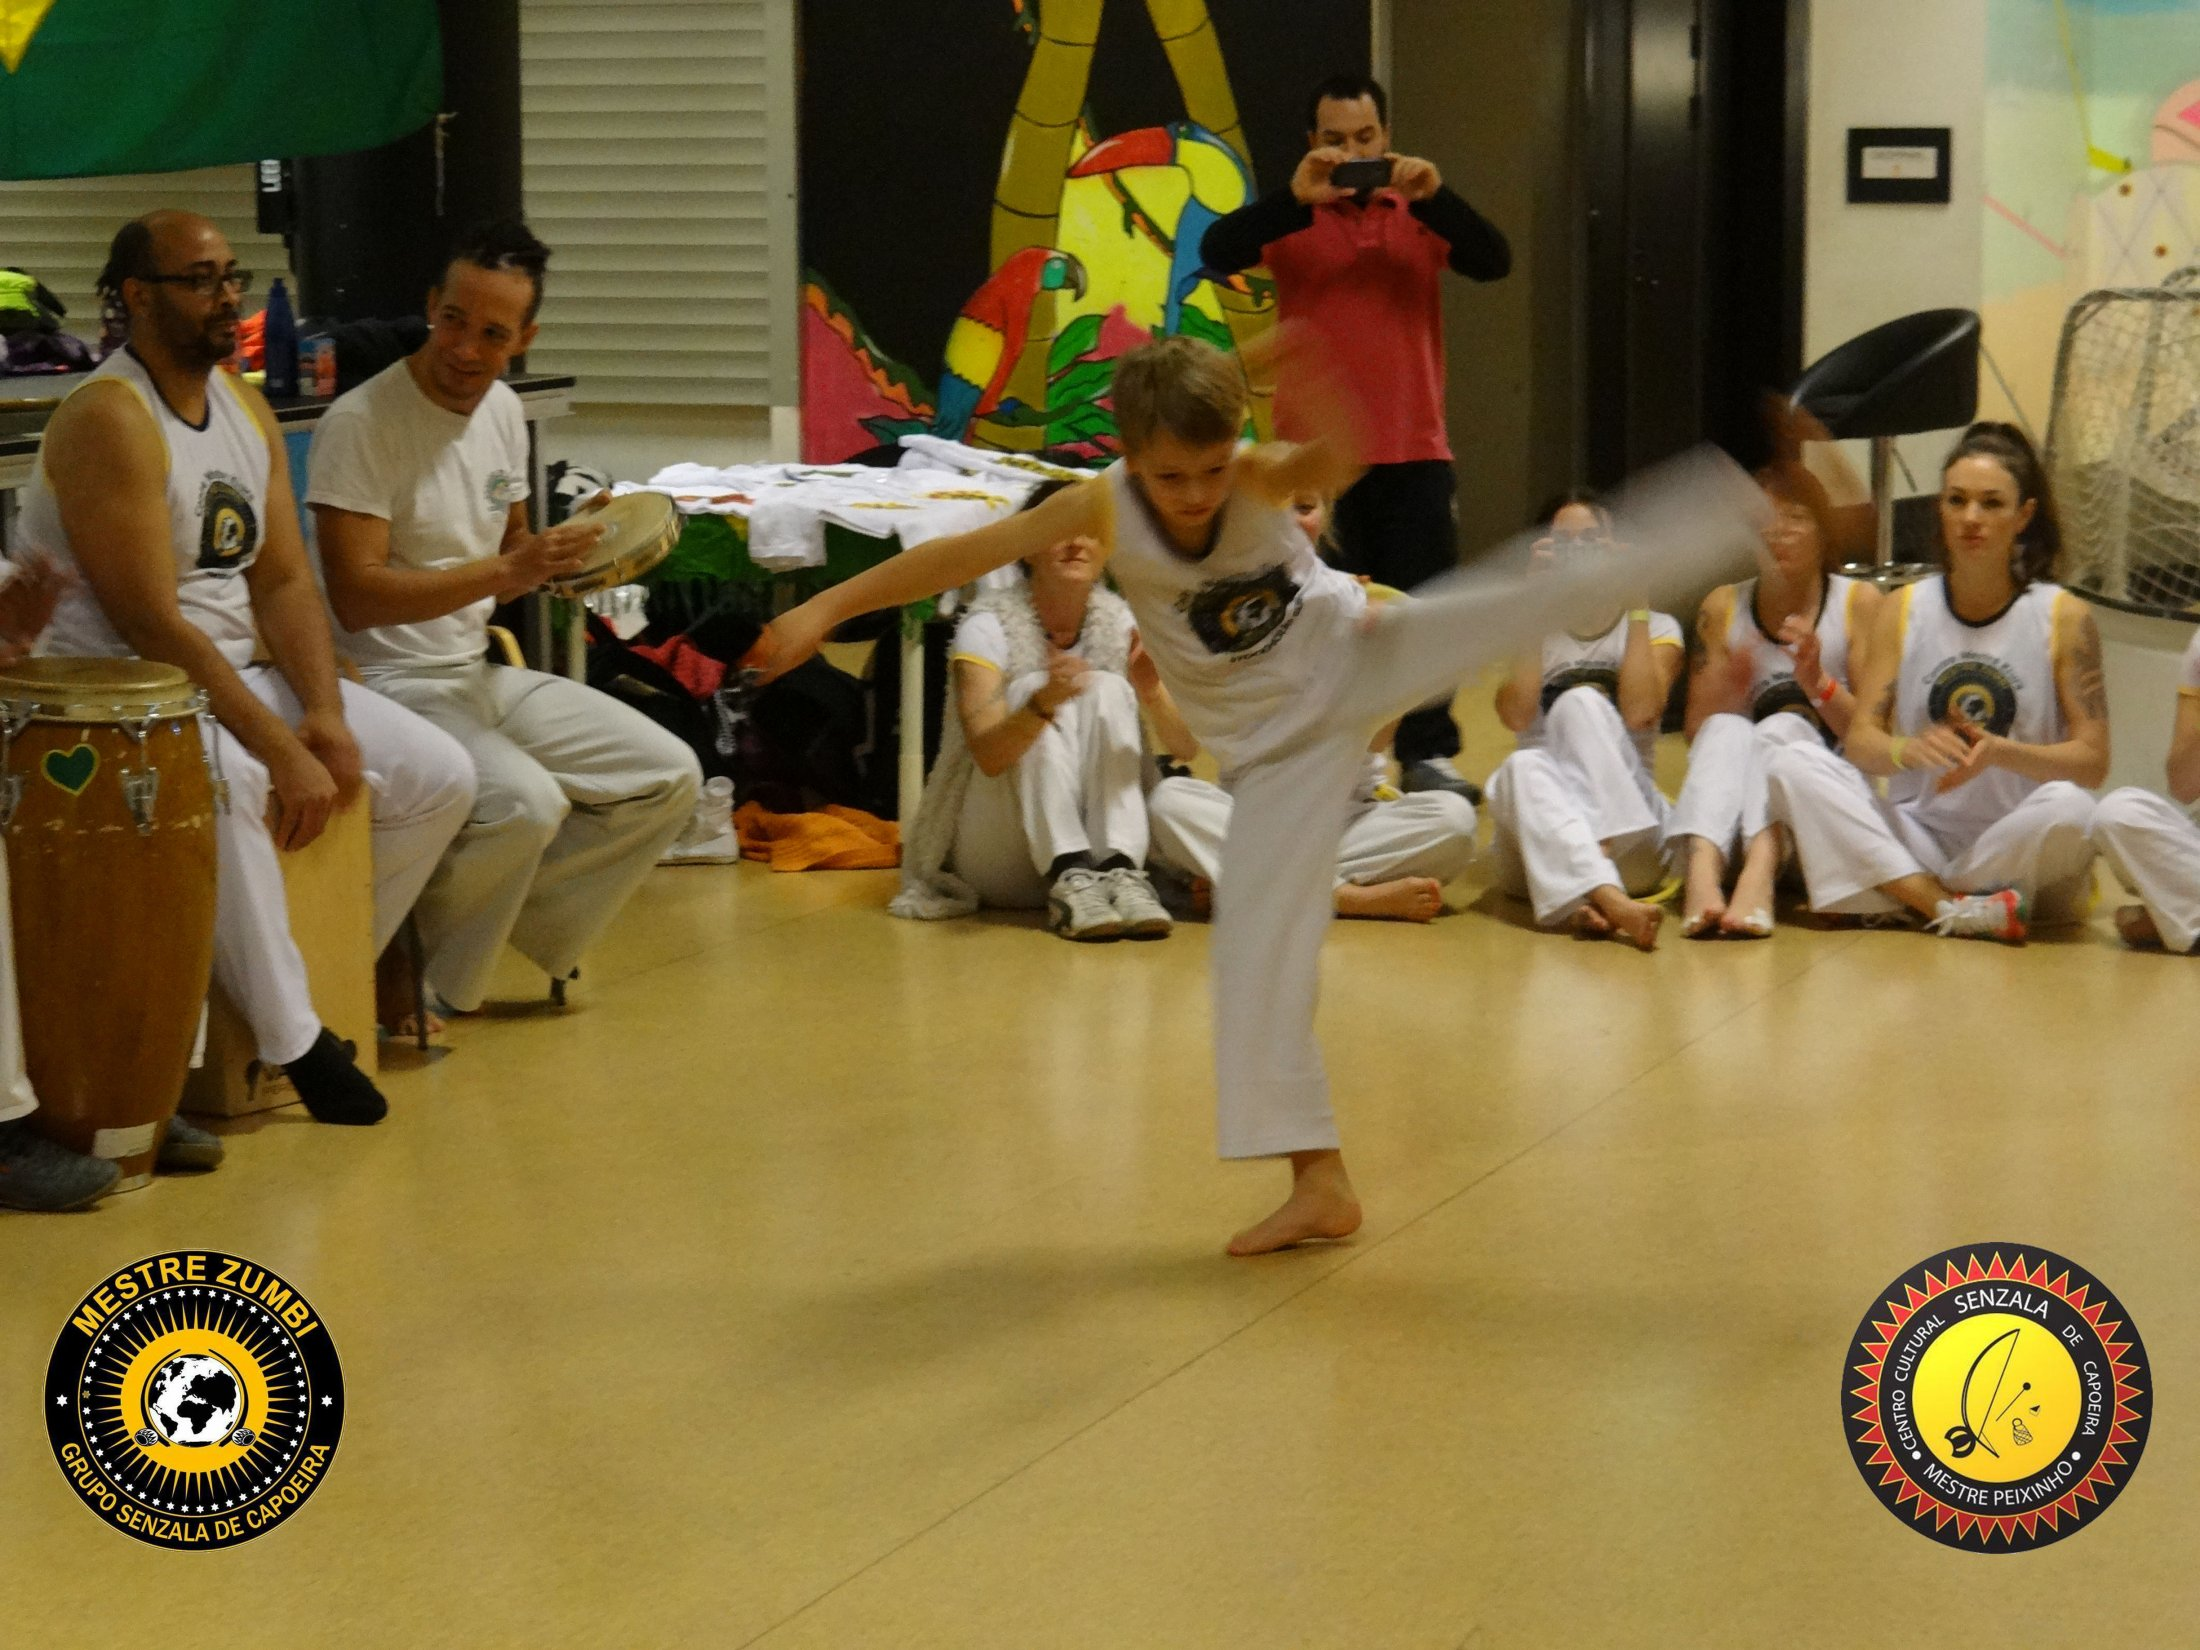 2013-12-14 - Capoeira 033